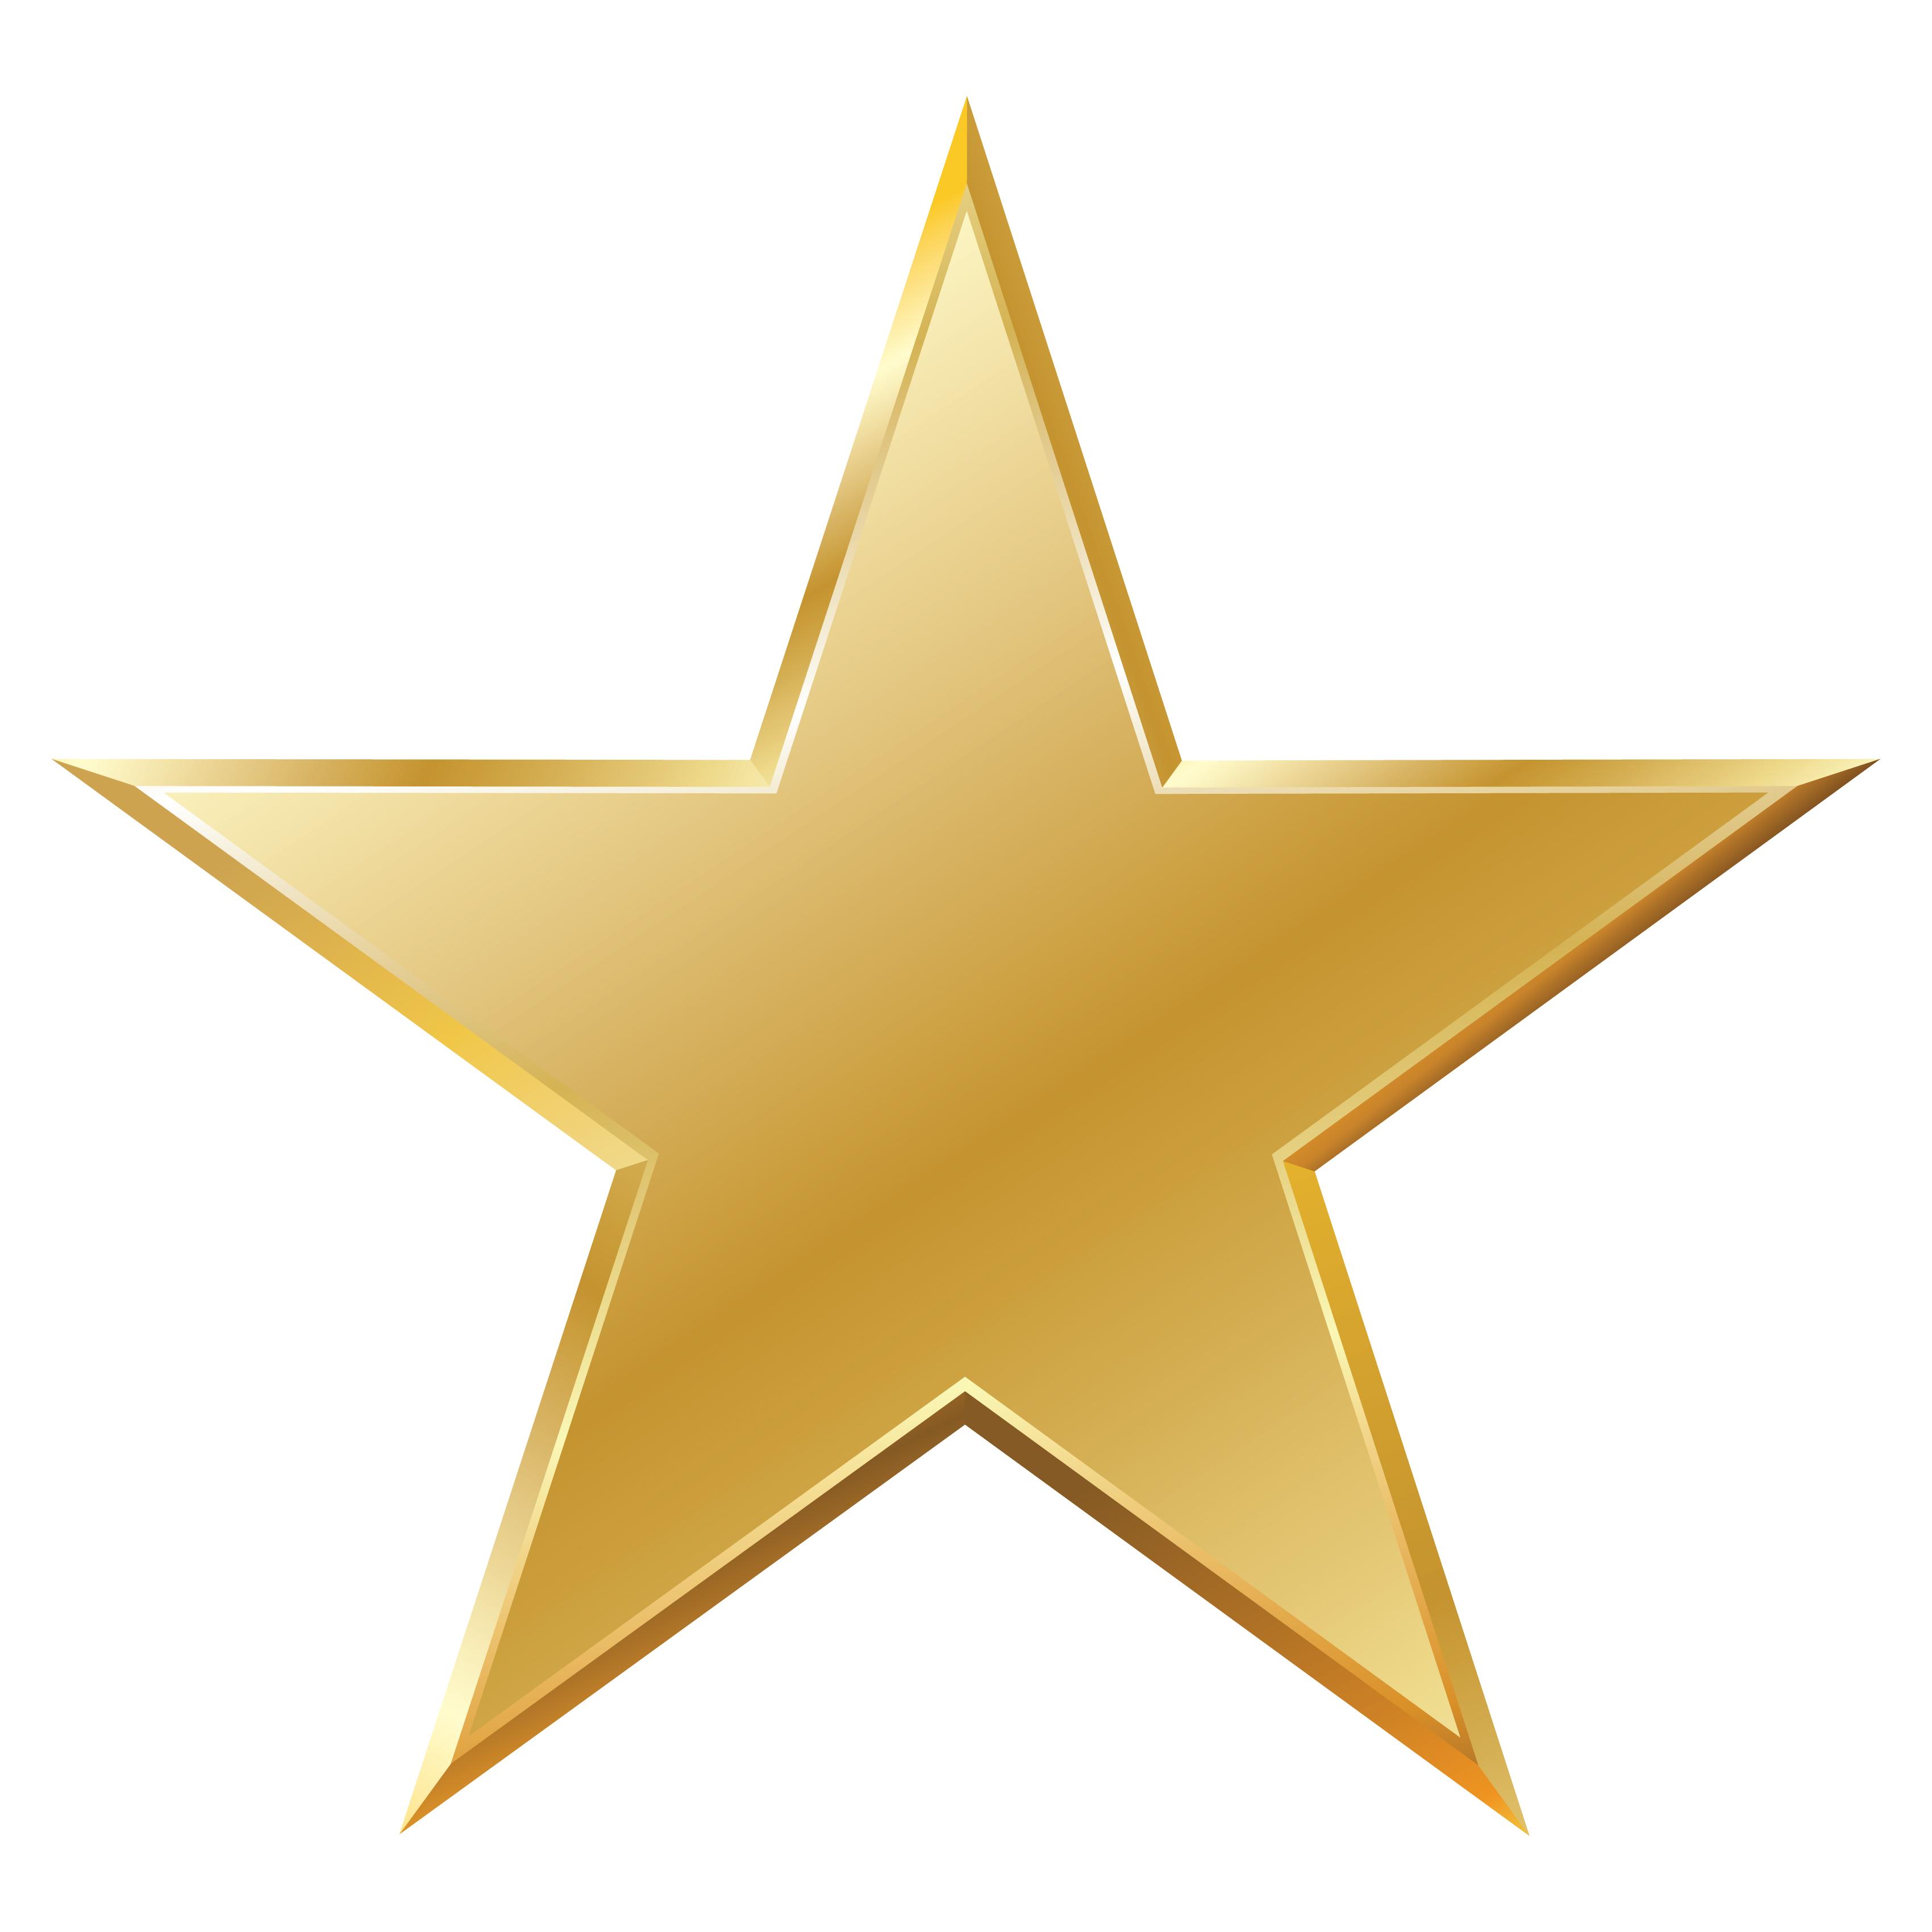 Star Gold Clip art.